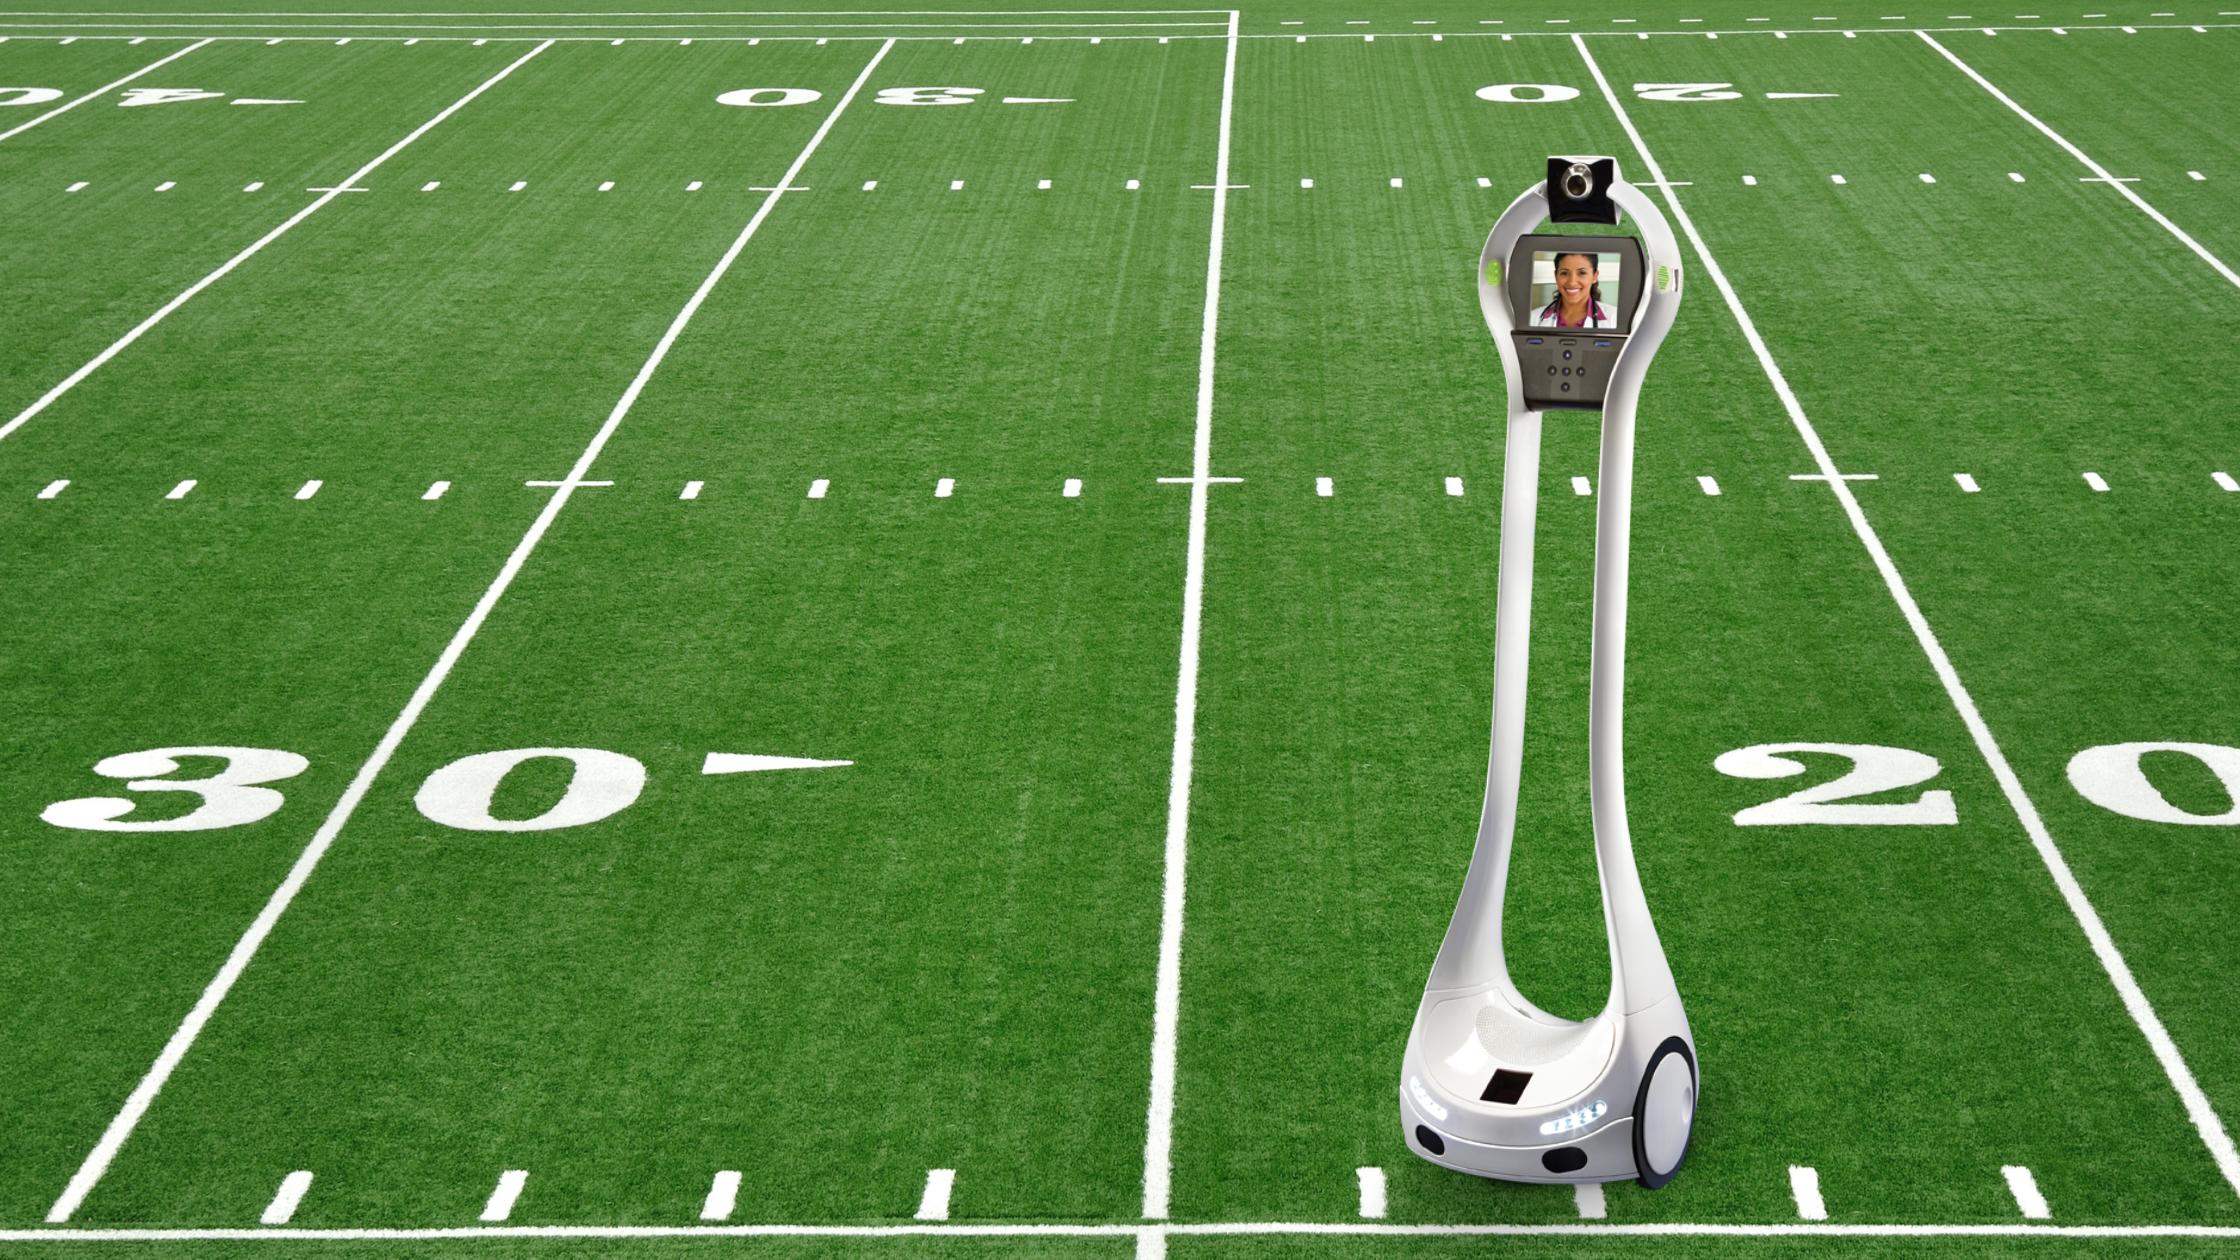 Telemedicine: Bringing Digital Doctors to the Football Field